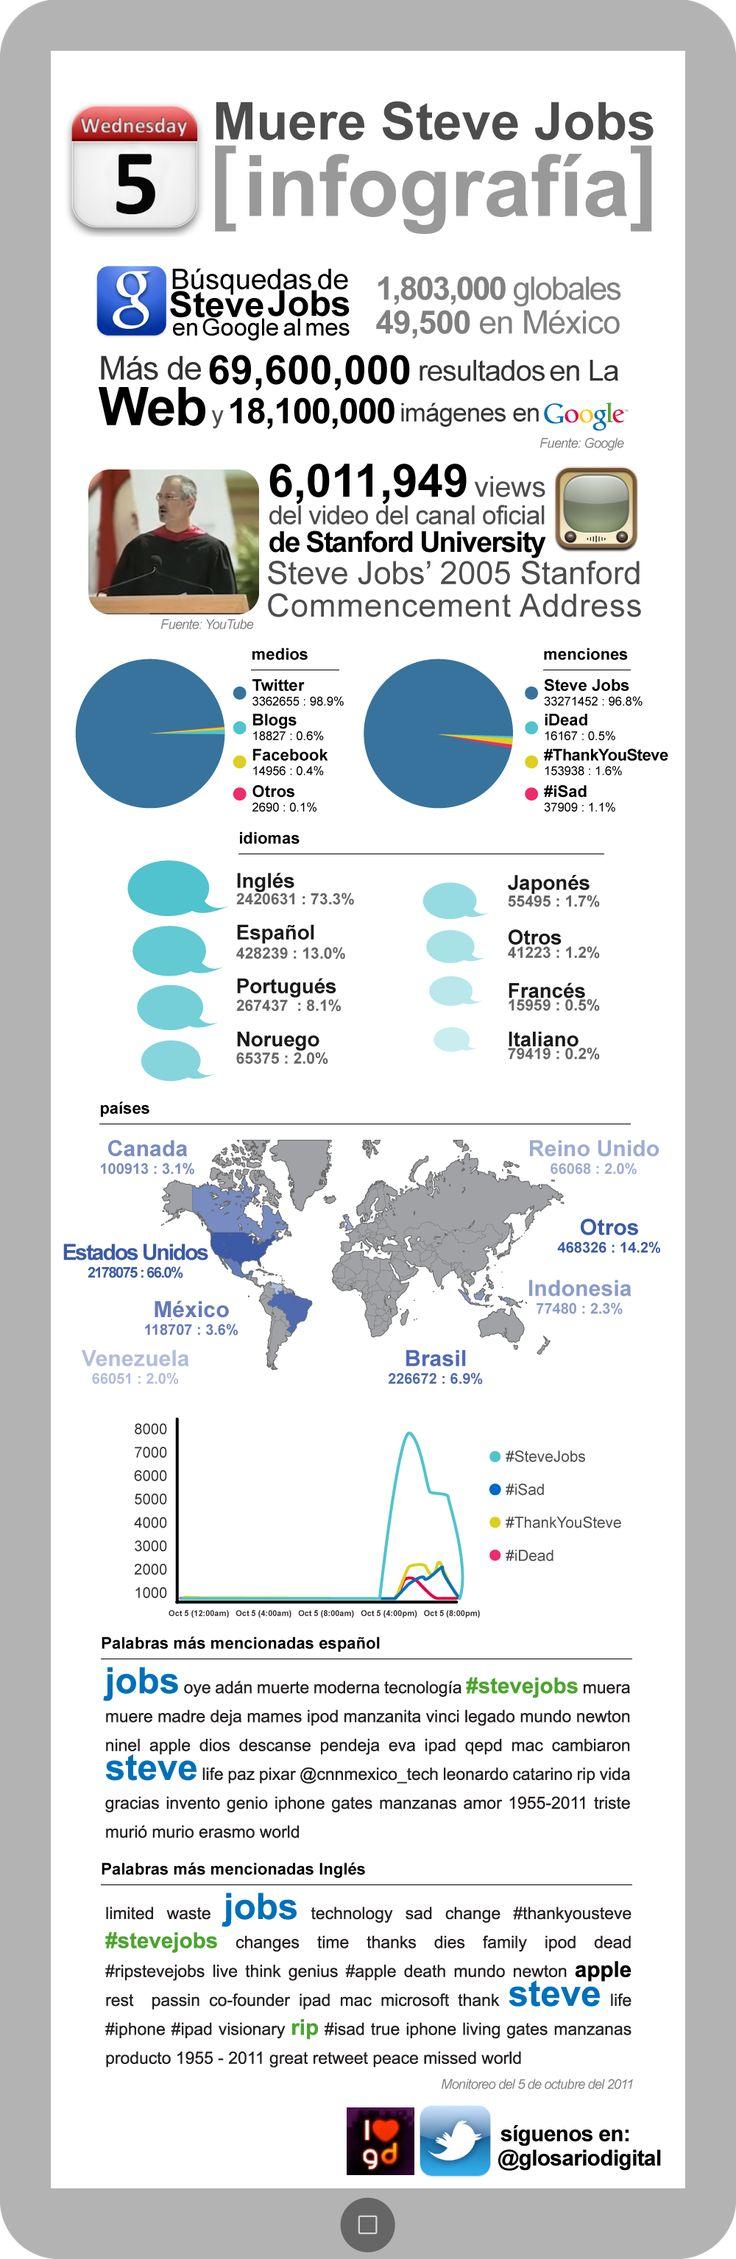 Repercusión de la muerte de Steve Jobs en Internet #infografia #internet #apple